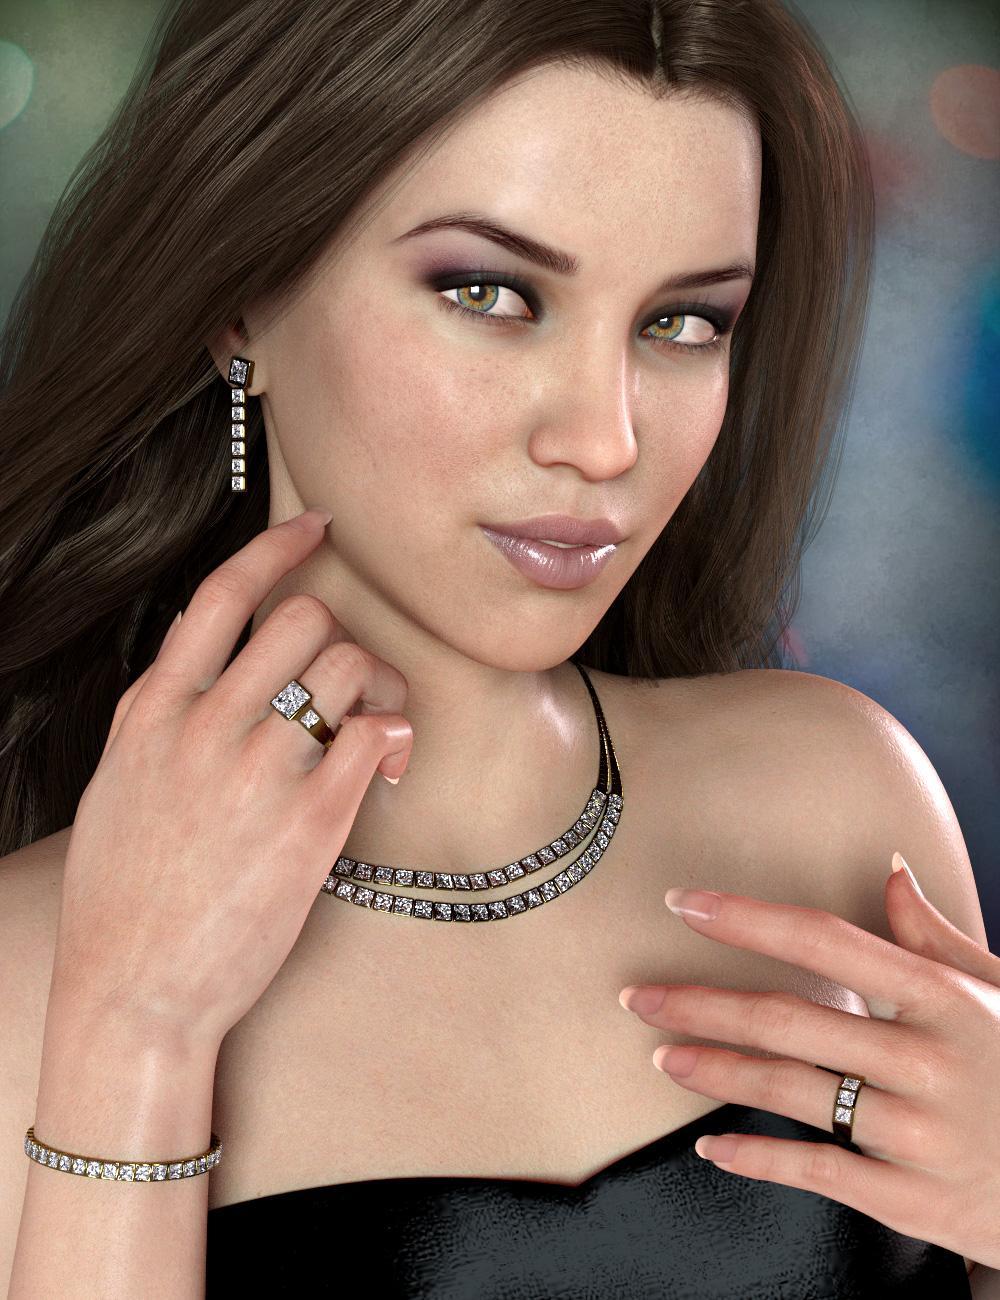 Classic Diamond Jewelry by: esha, 3D Models by Daz 3D